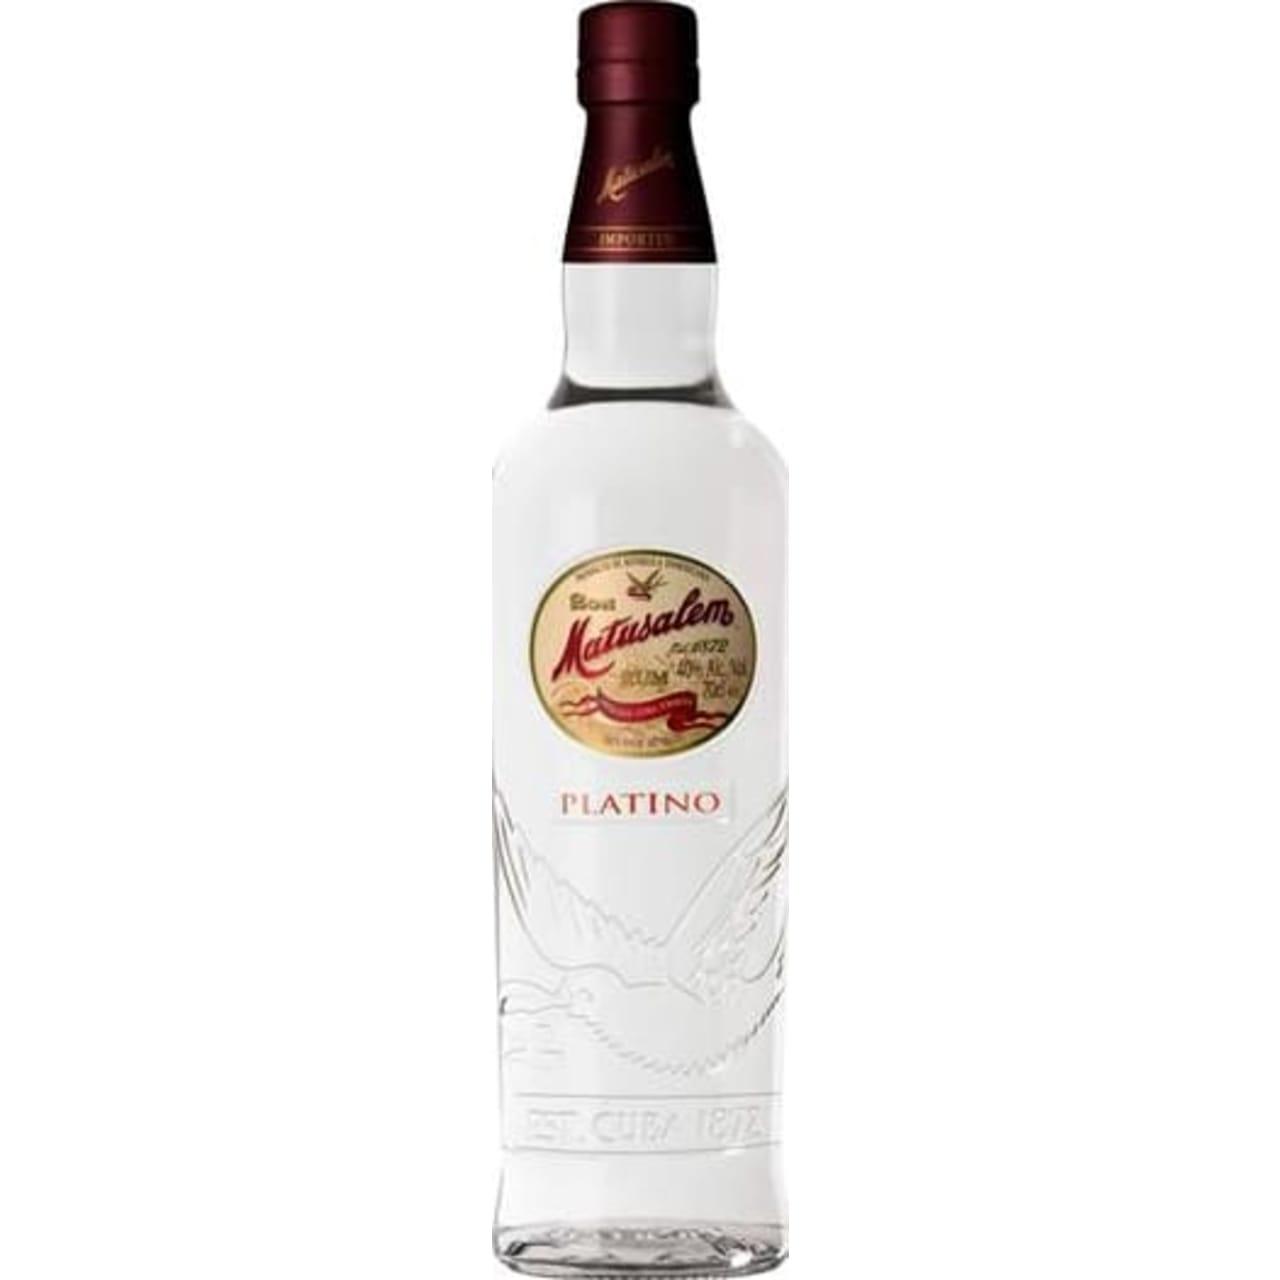 Product Image - Matusalem Platino Rum